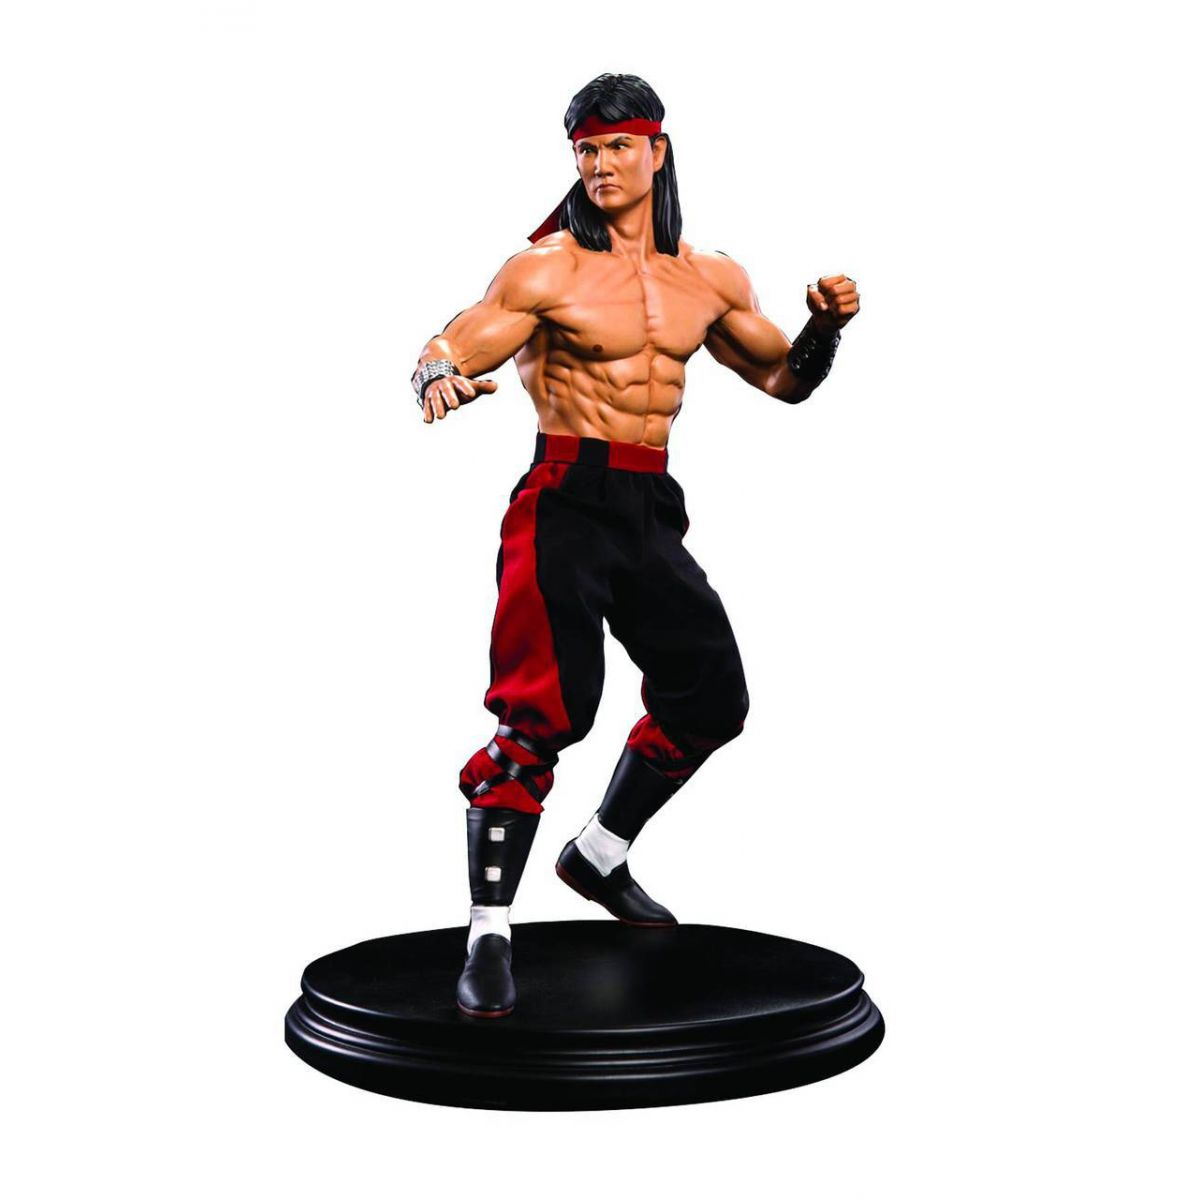 Estátua Liu Kang: Mortal Kombat (Escala 1/4) - Pop Culture Shock (Apenas Venda Online)